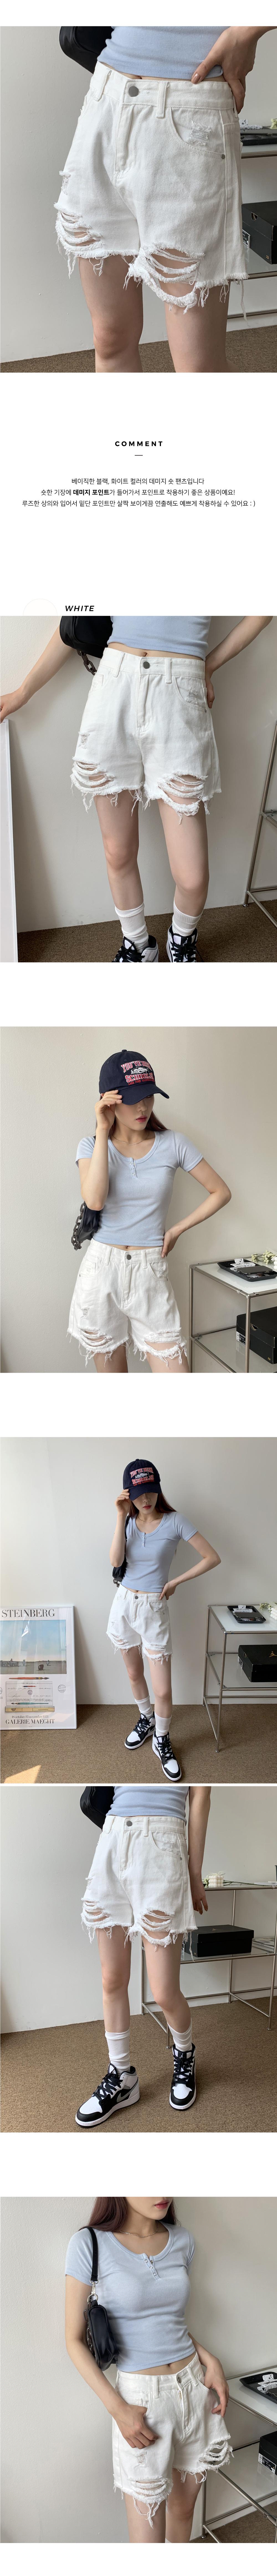 Fly Damage Split Cotton Short Pants